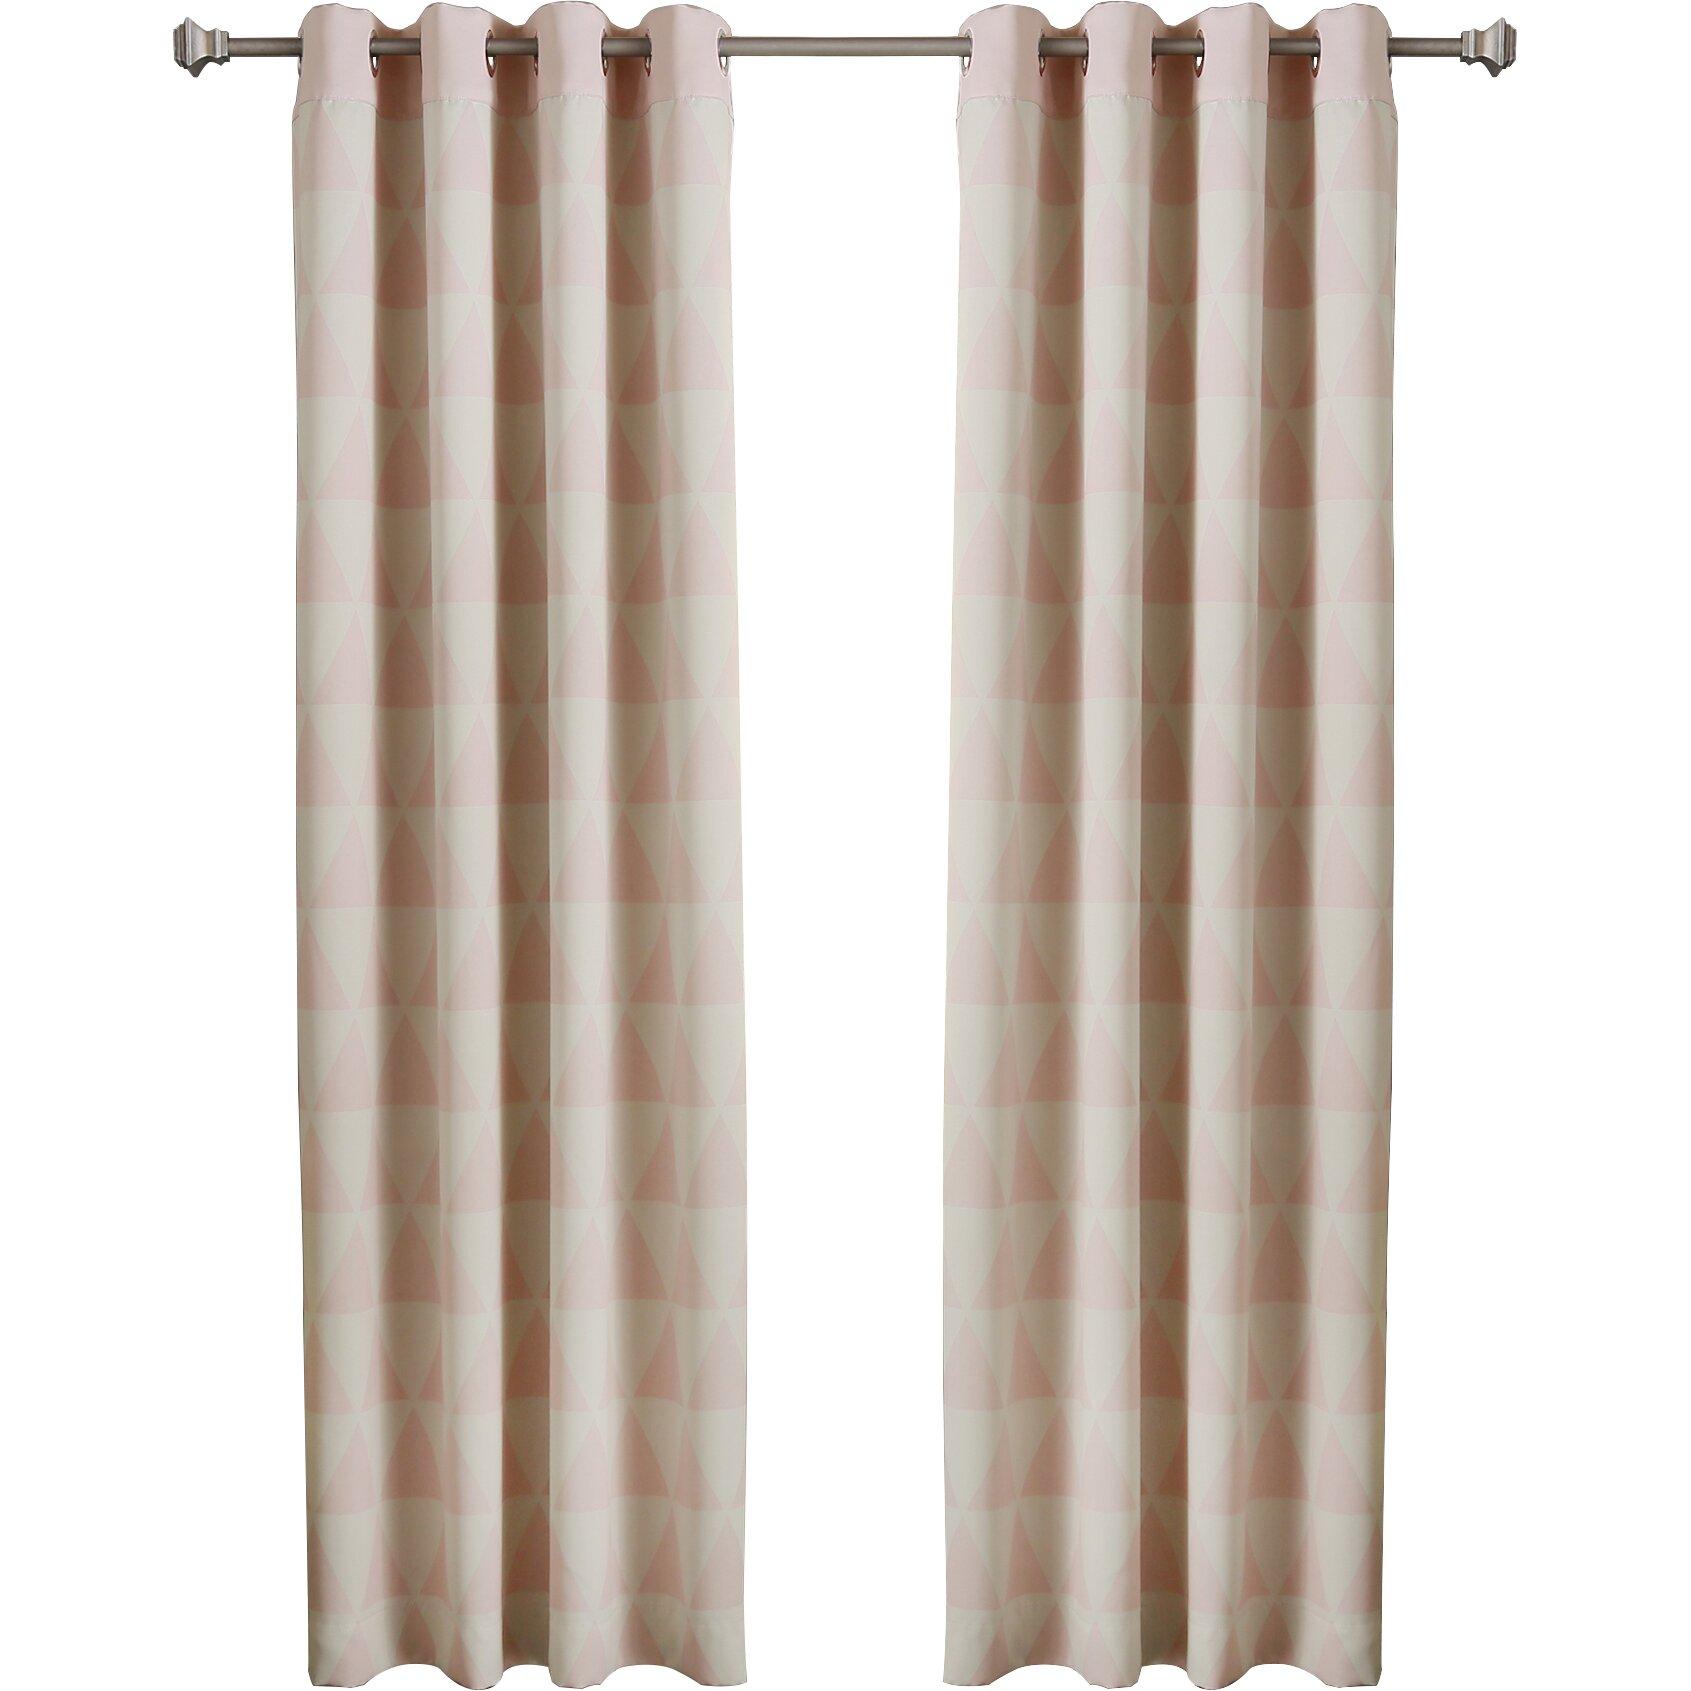 Best Home Fashion, Inc. Scandinavian Room Darkening Thermal Curtain